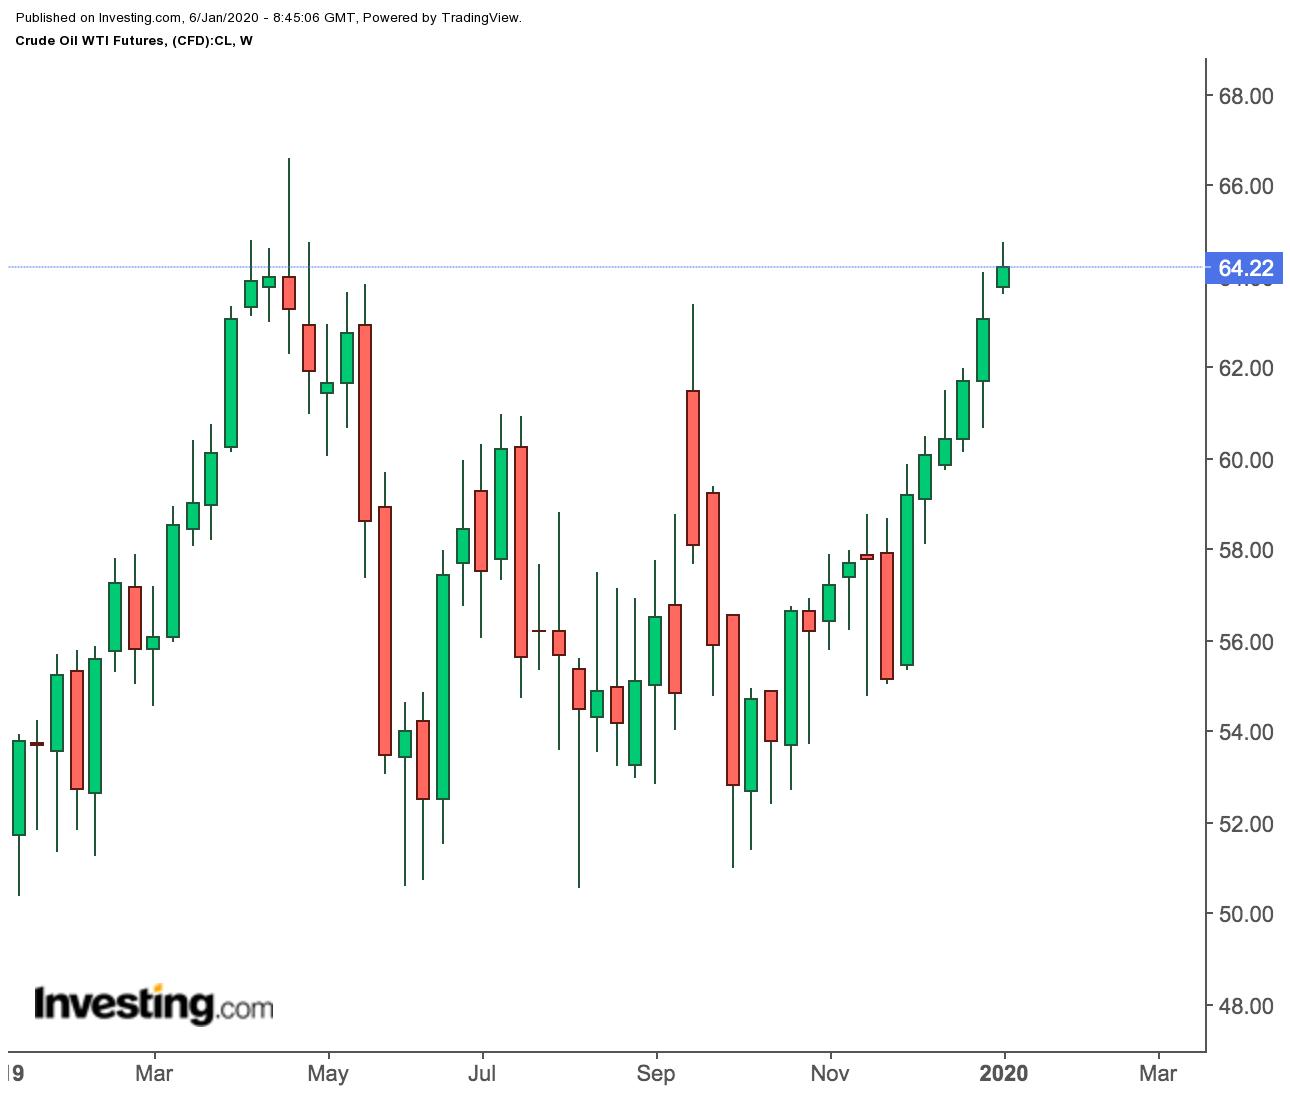 WTI Futures Weekly Price Chart